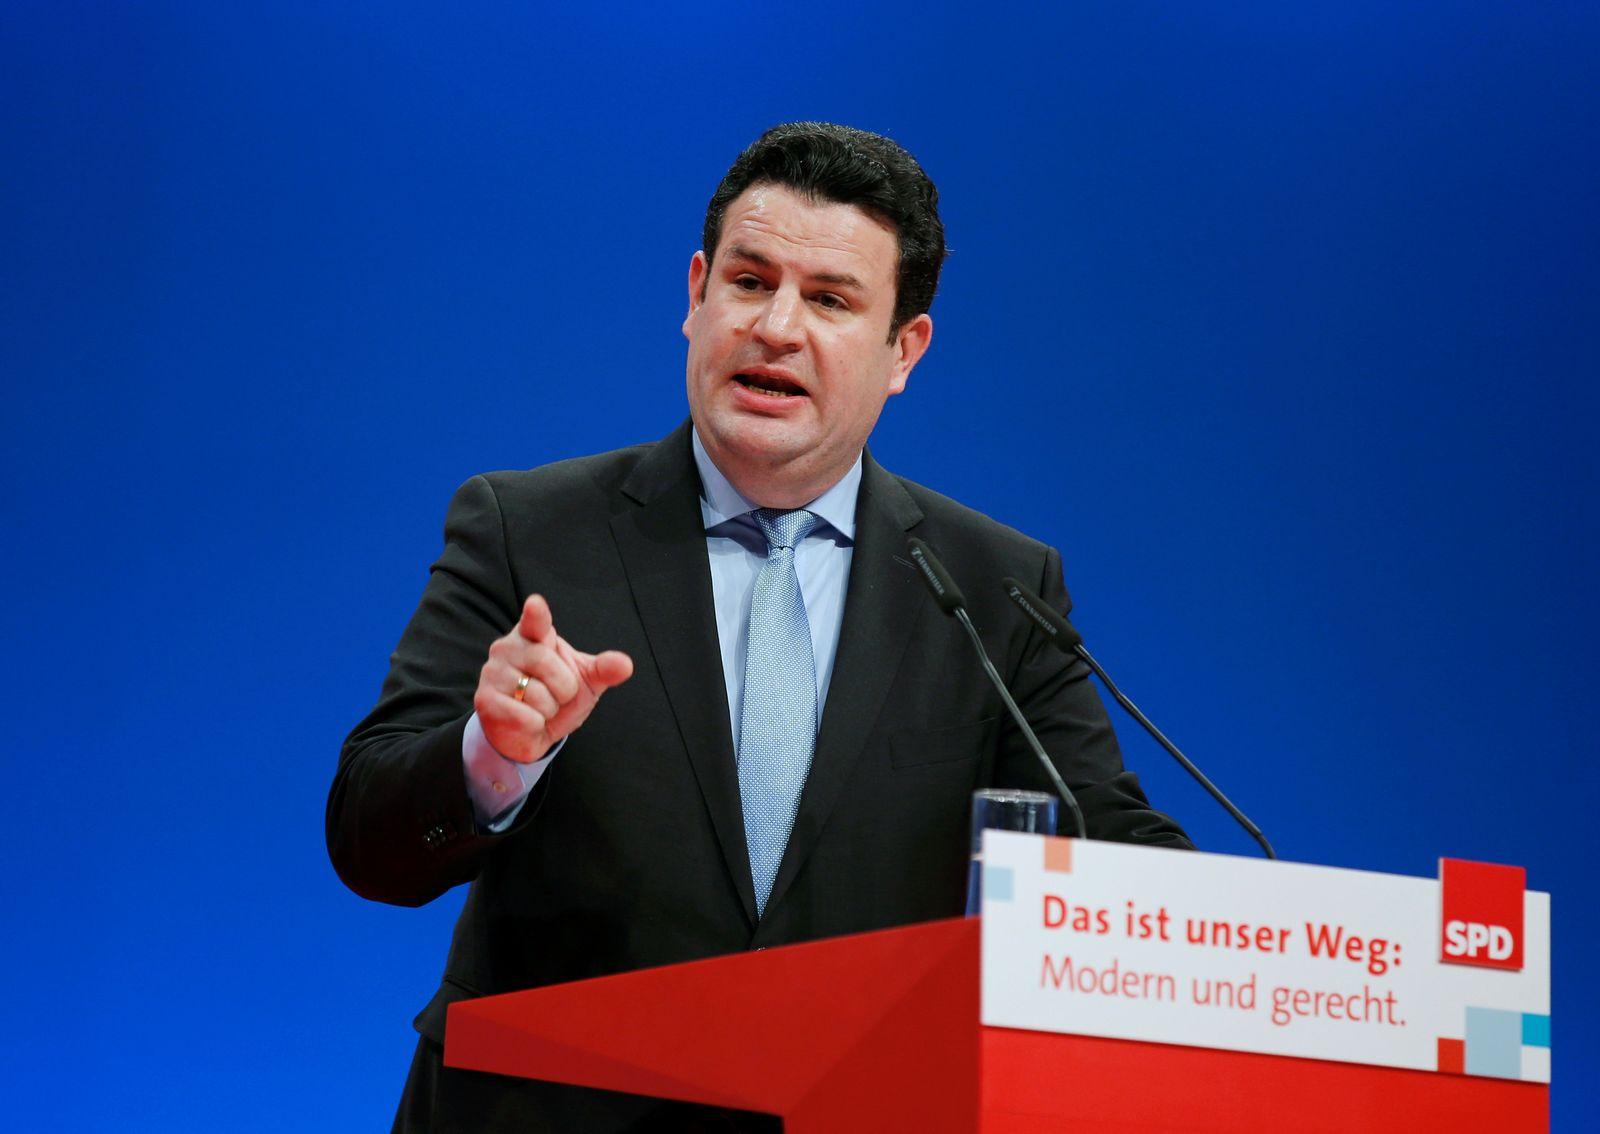 SPD-Minister/ Hubertus Heil